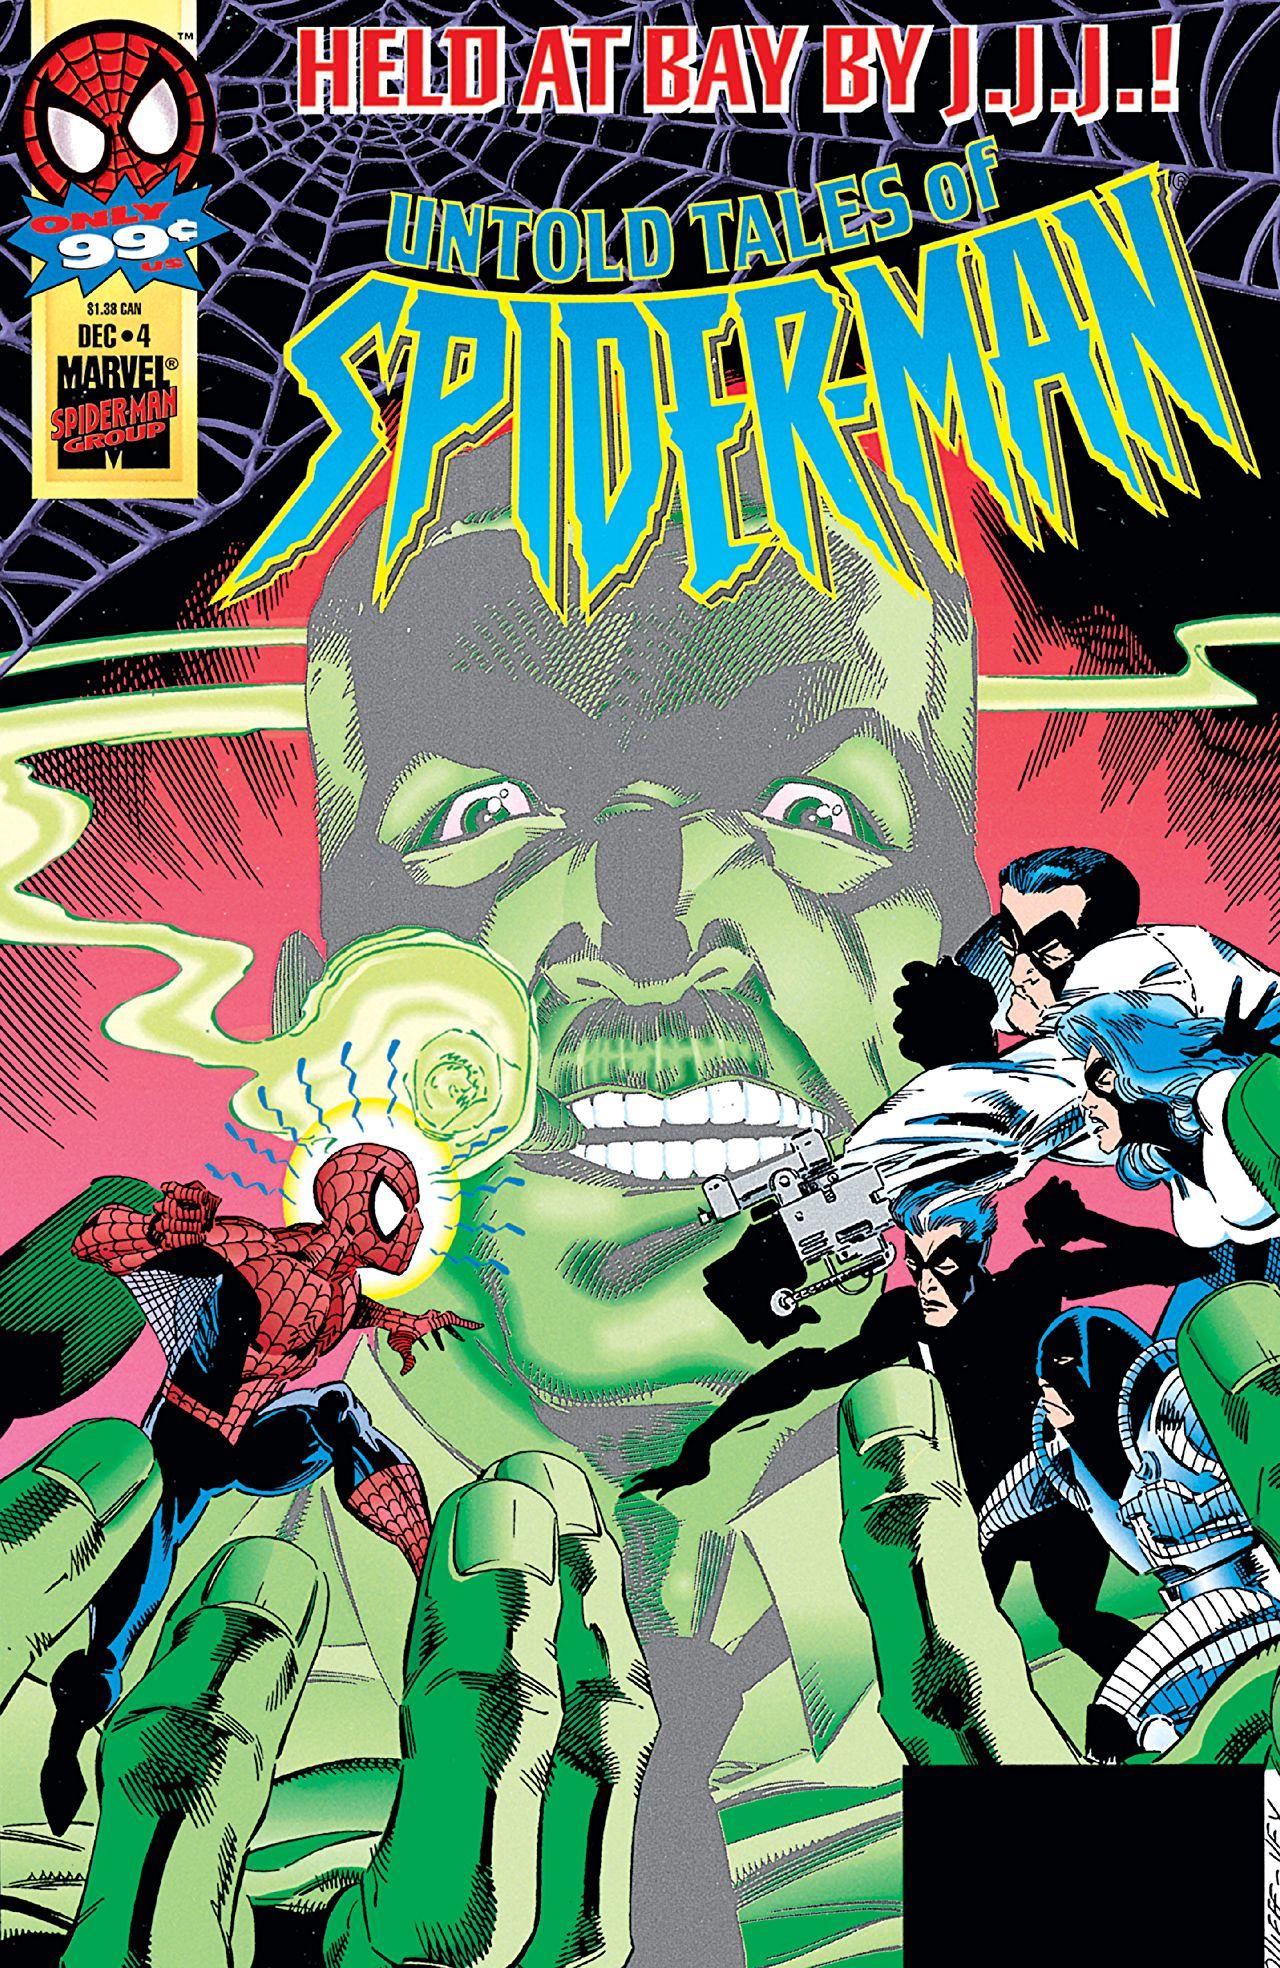 Untold Tales of Spider-Man Vol 1 4.jpg